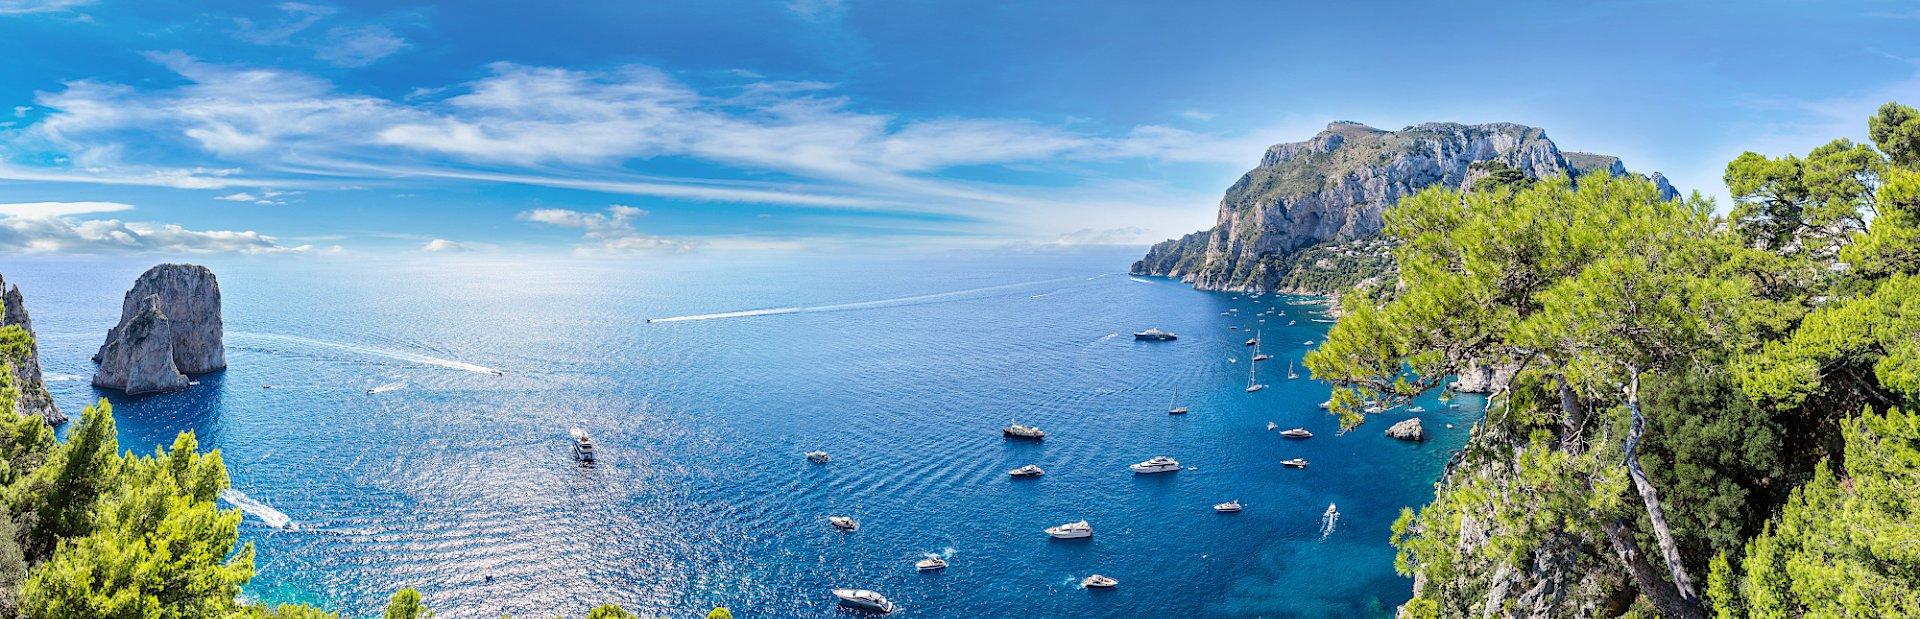 blue waters and sunny skies yachts cruising amalfi coast